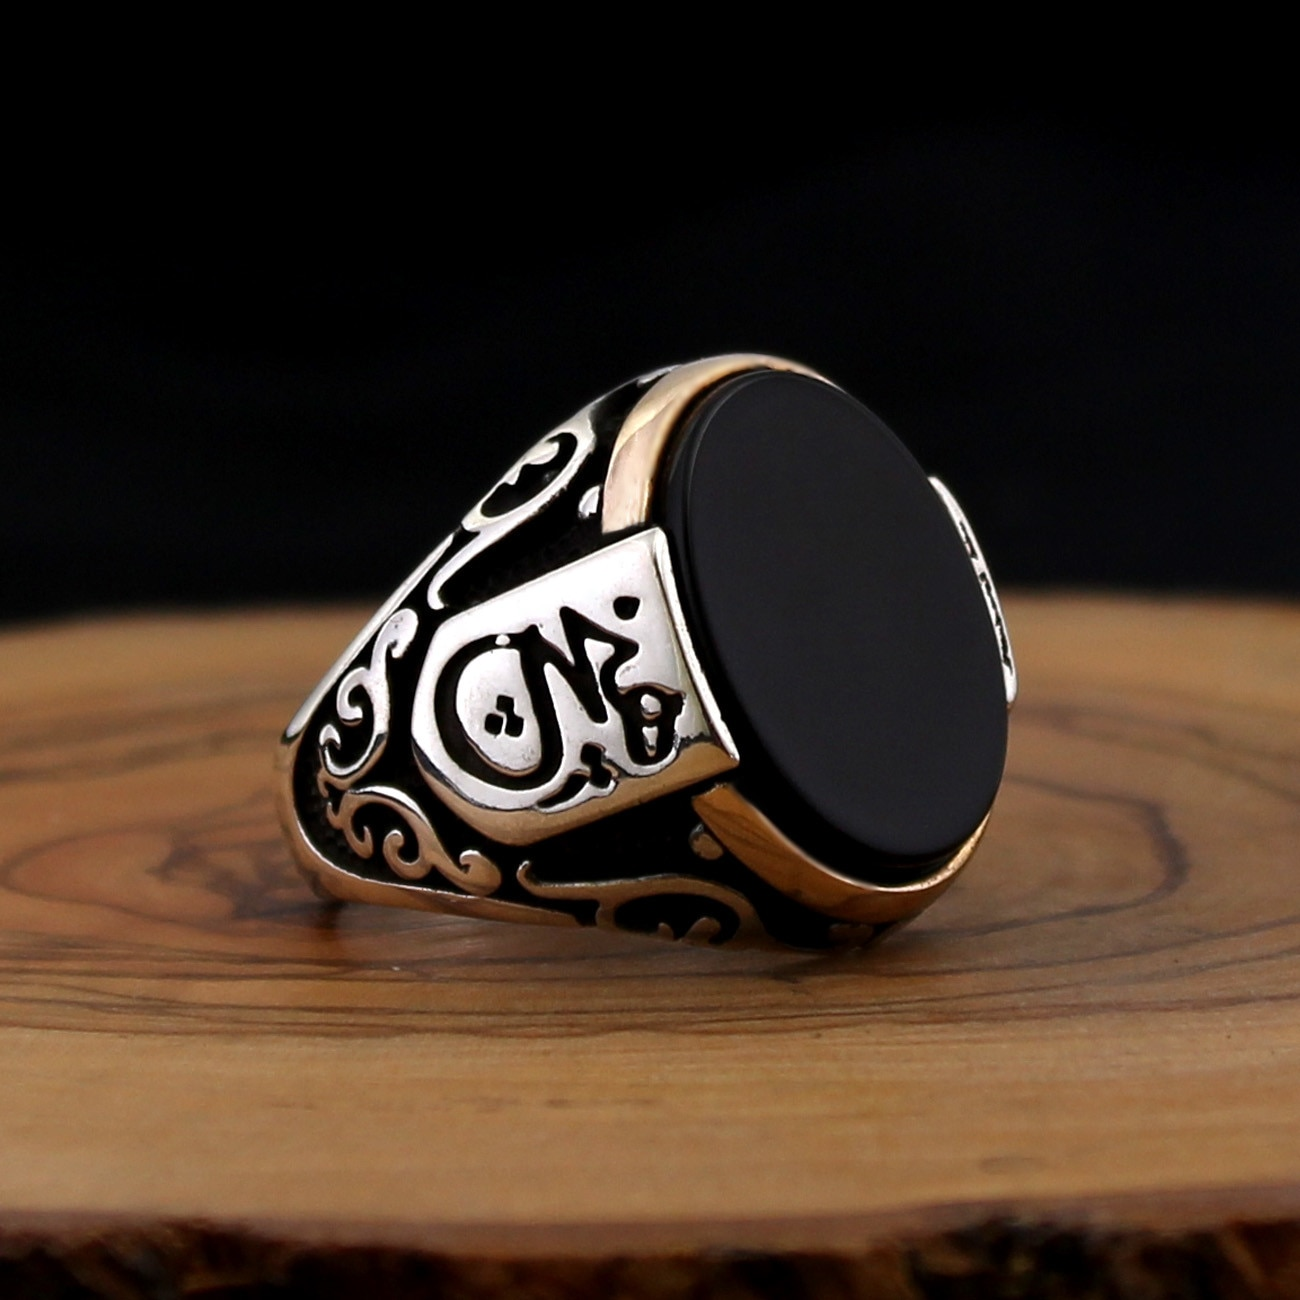 Anillo de Plata de Ley 925 para hombre con ónix negro Aqeeq, anillo de piedra de circón, anillos de regalo para hombre, todos los tamaños (hecho en Turquía)